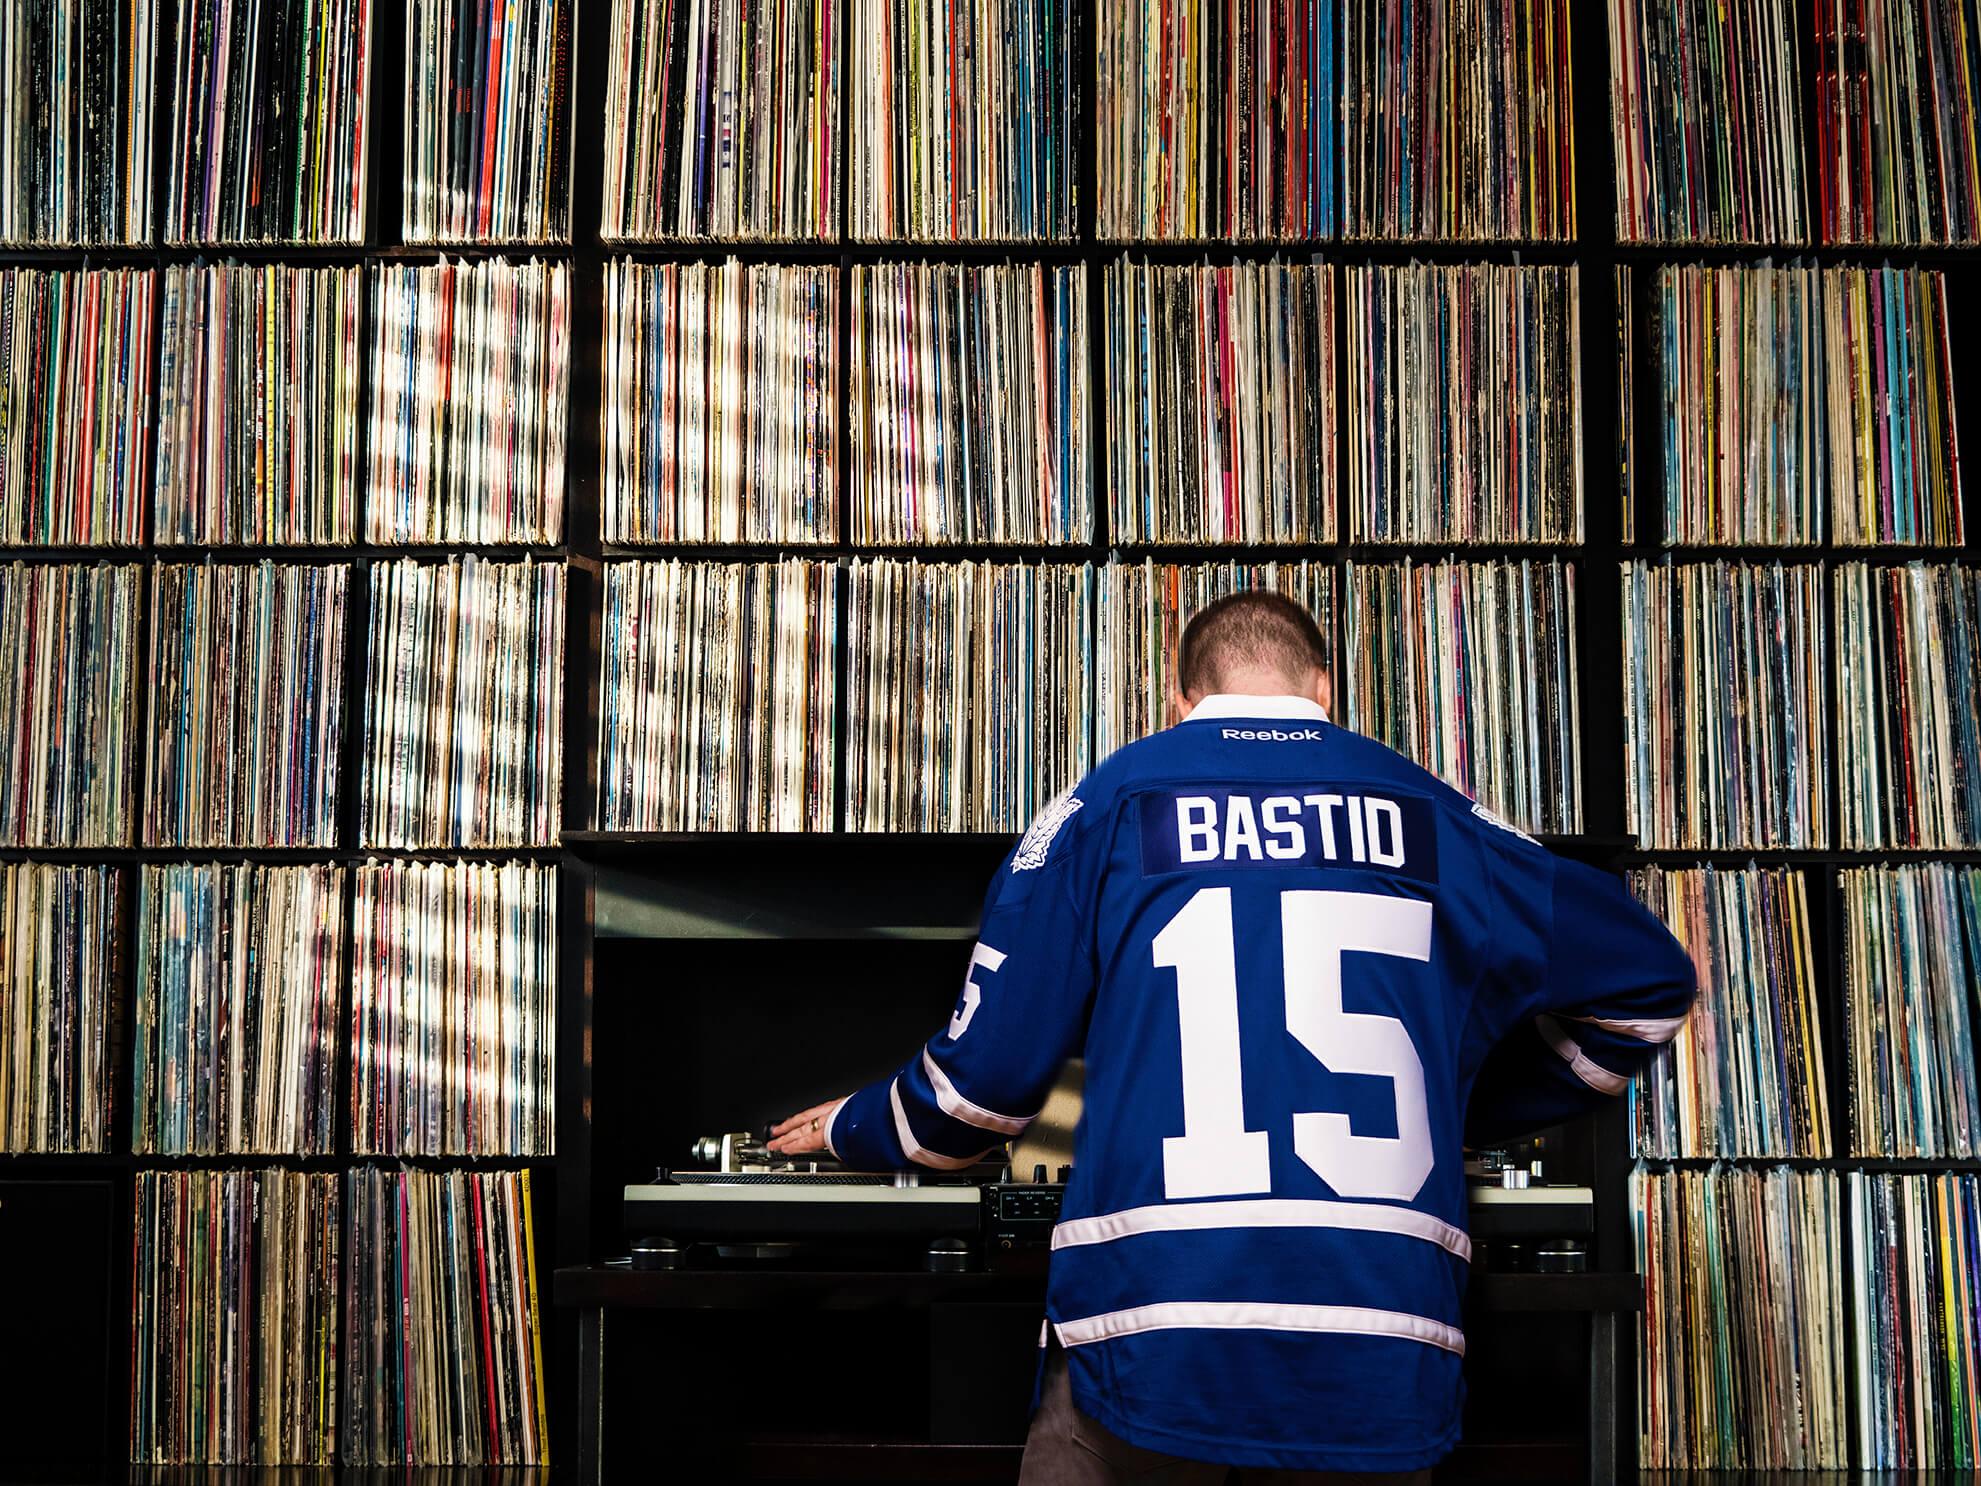 Unified Content, Unified Content Toronto, Max Rosenstein, Skratch Bastid, DJ, Canadian DJ, Skratch Bastid DJ, Toronto DJ, portrait, artistic, photography, portrait photography, celebrity portrait, celebrity portrait photography, style,